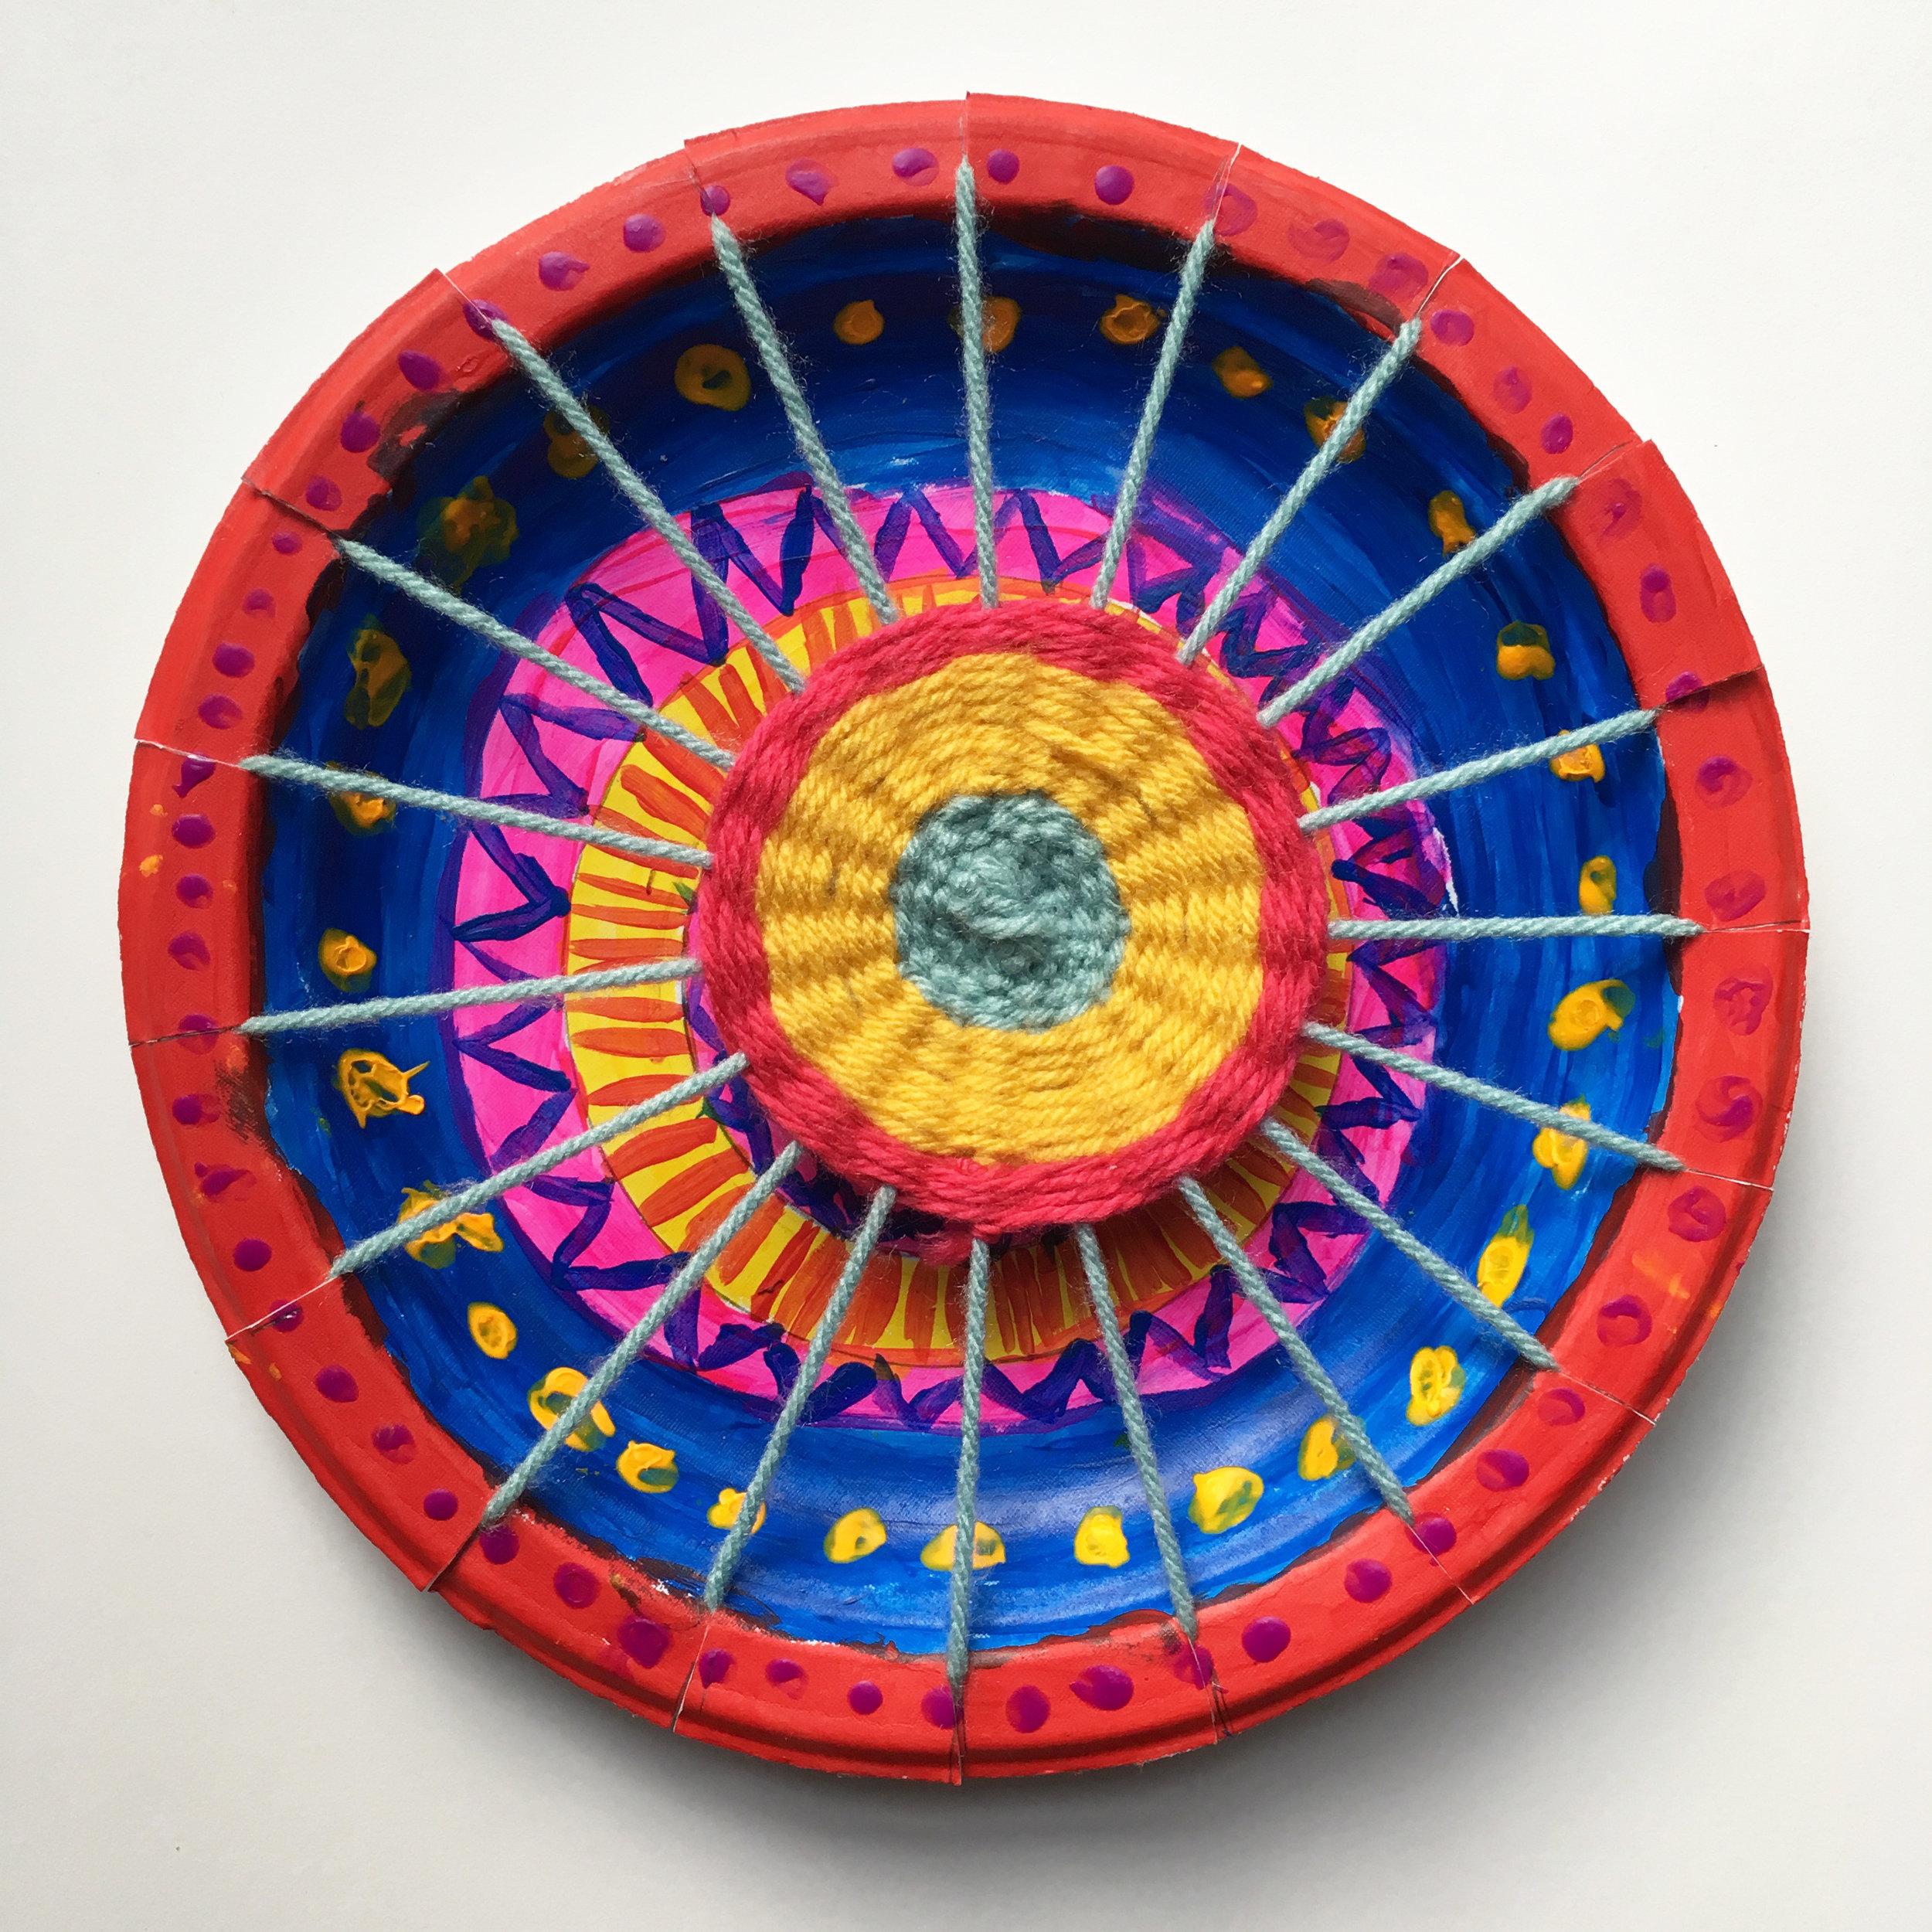 Rosayma_circular weaving_01.jpg